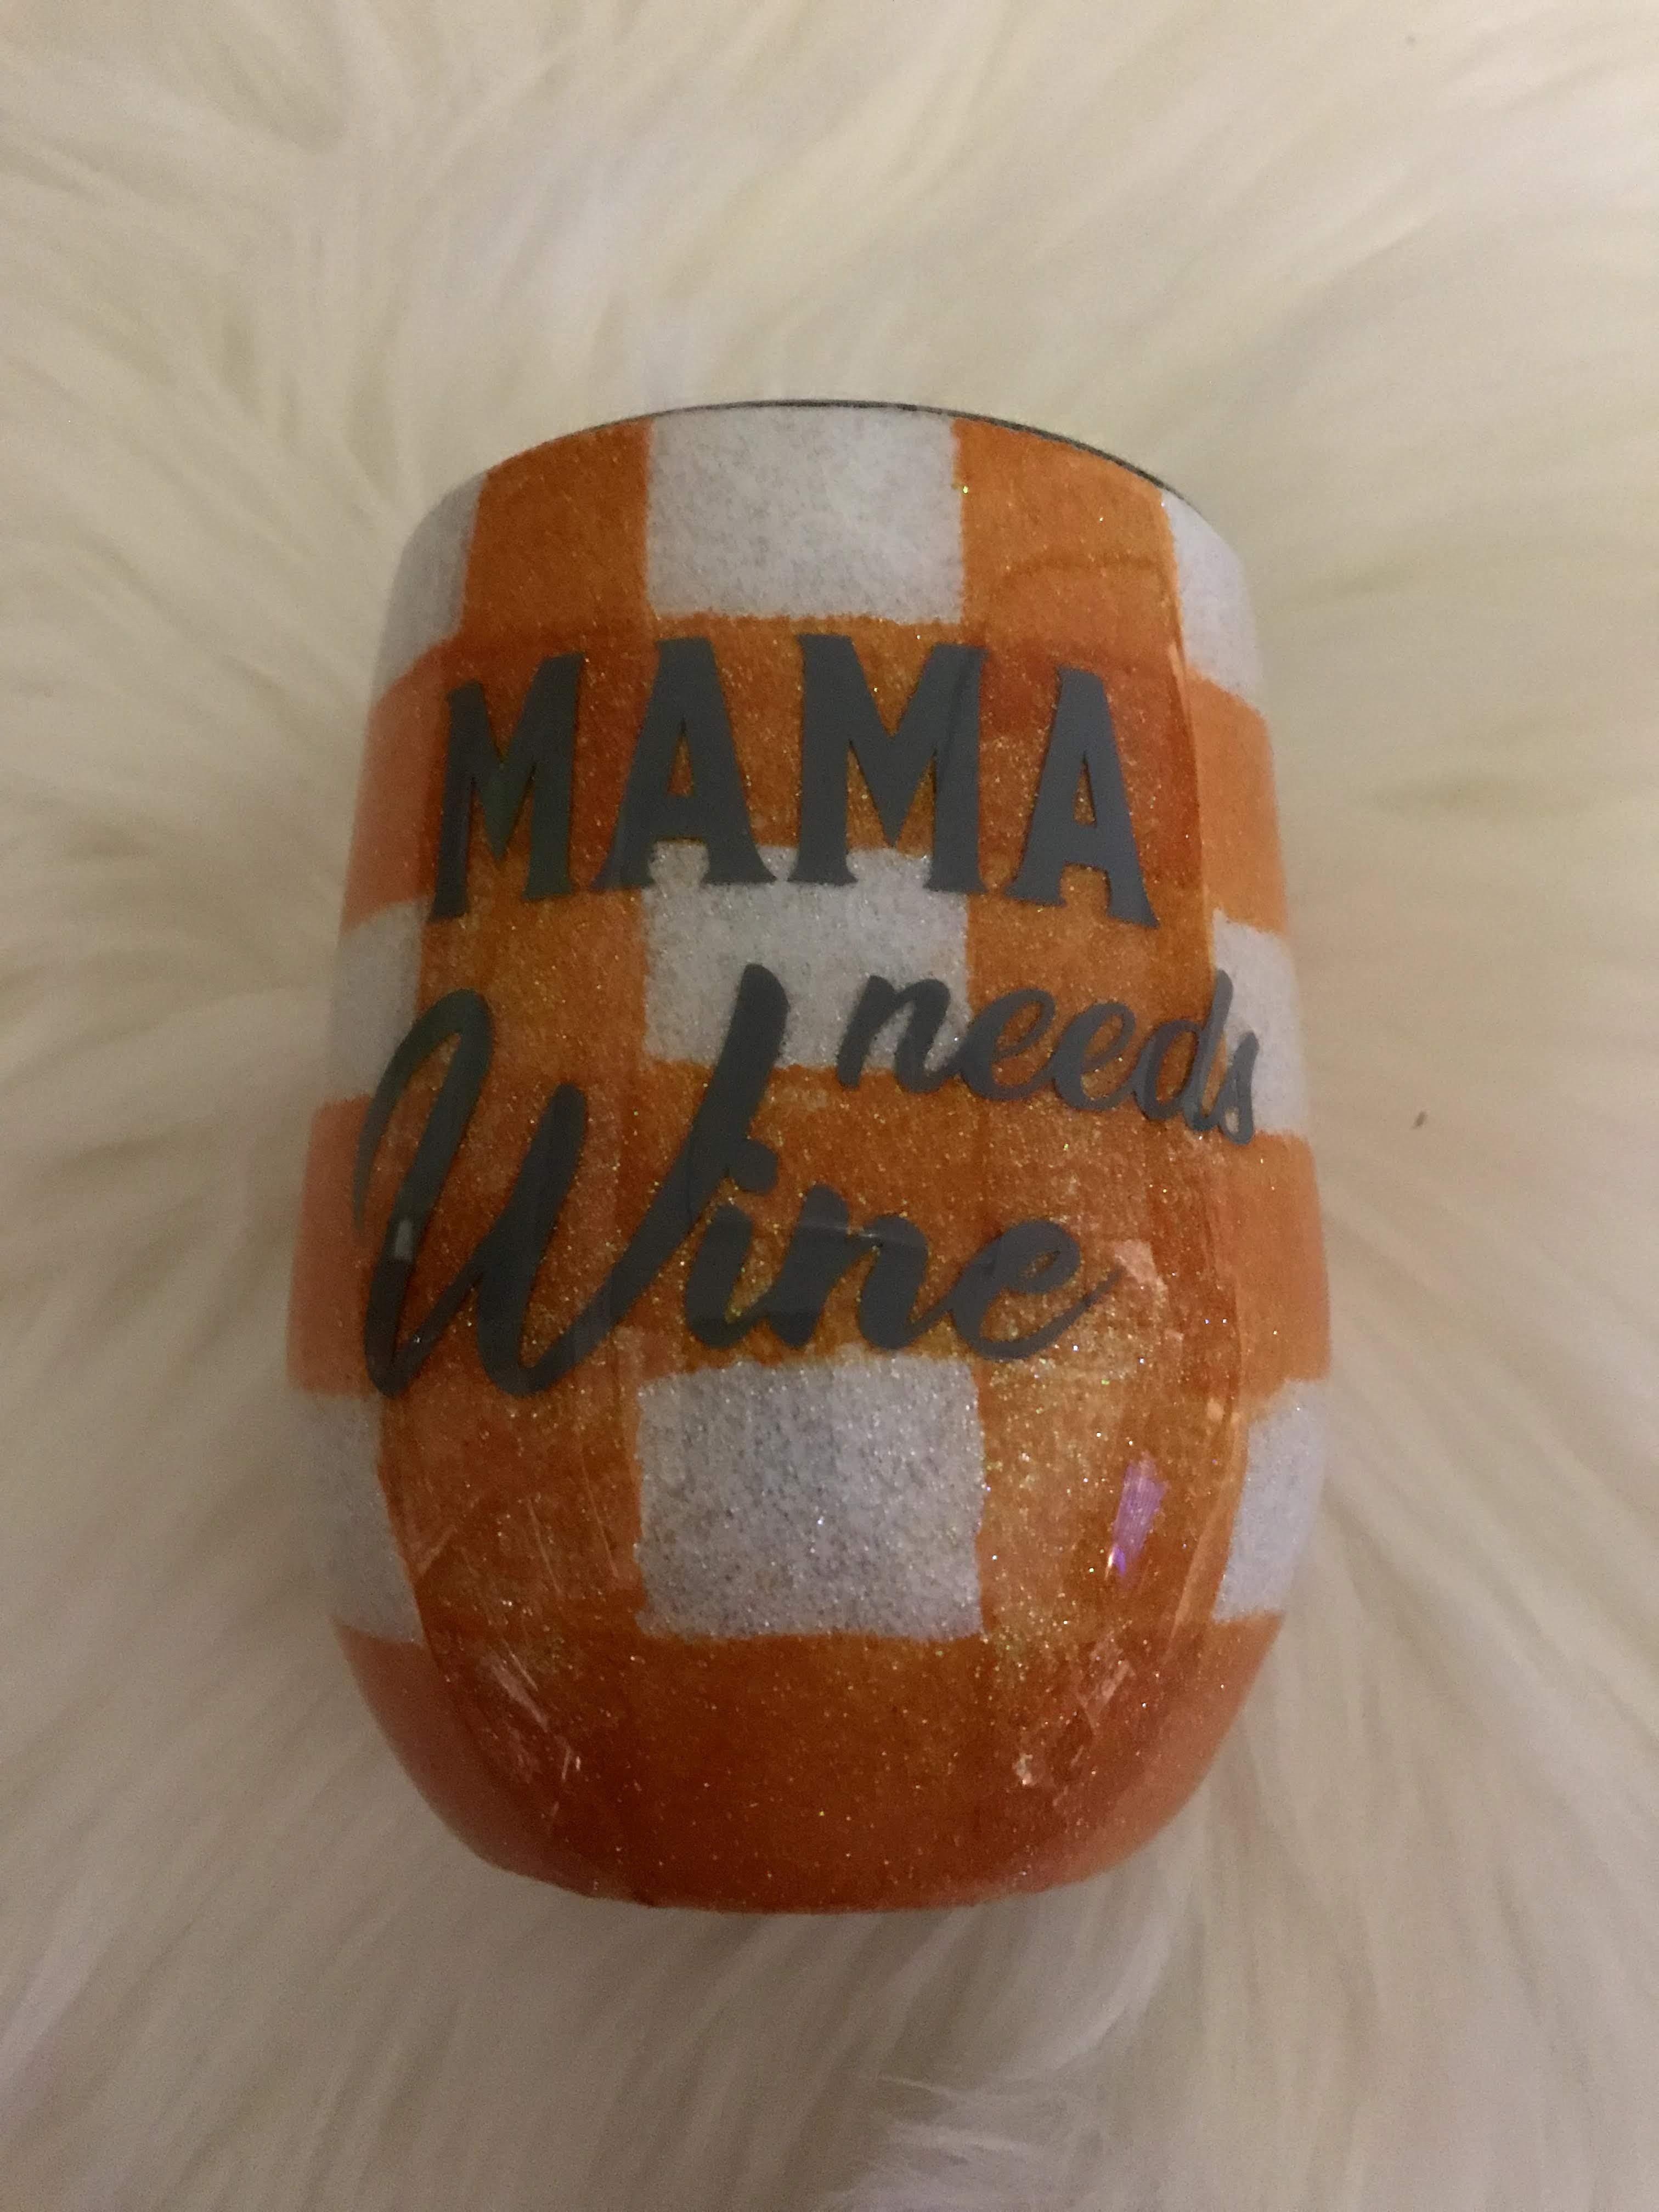 Thumbnail: White And Orange Plaid wine tumbler